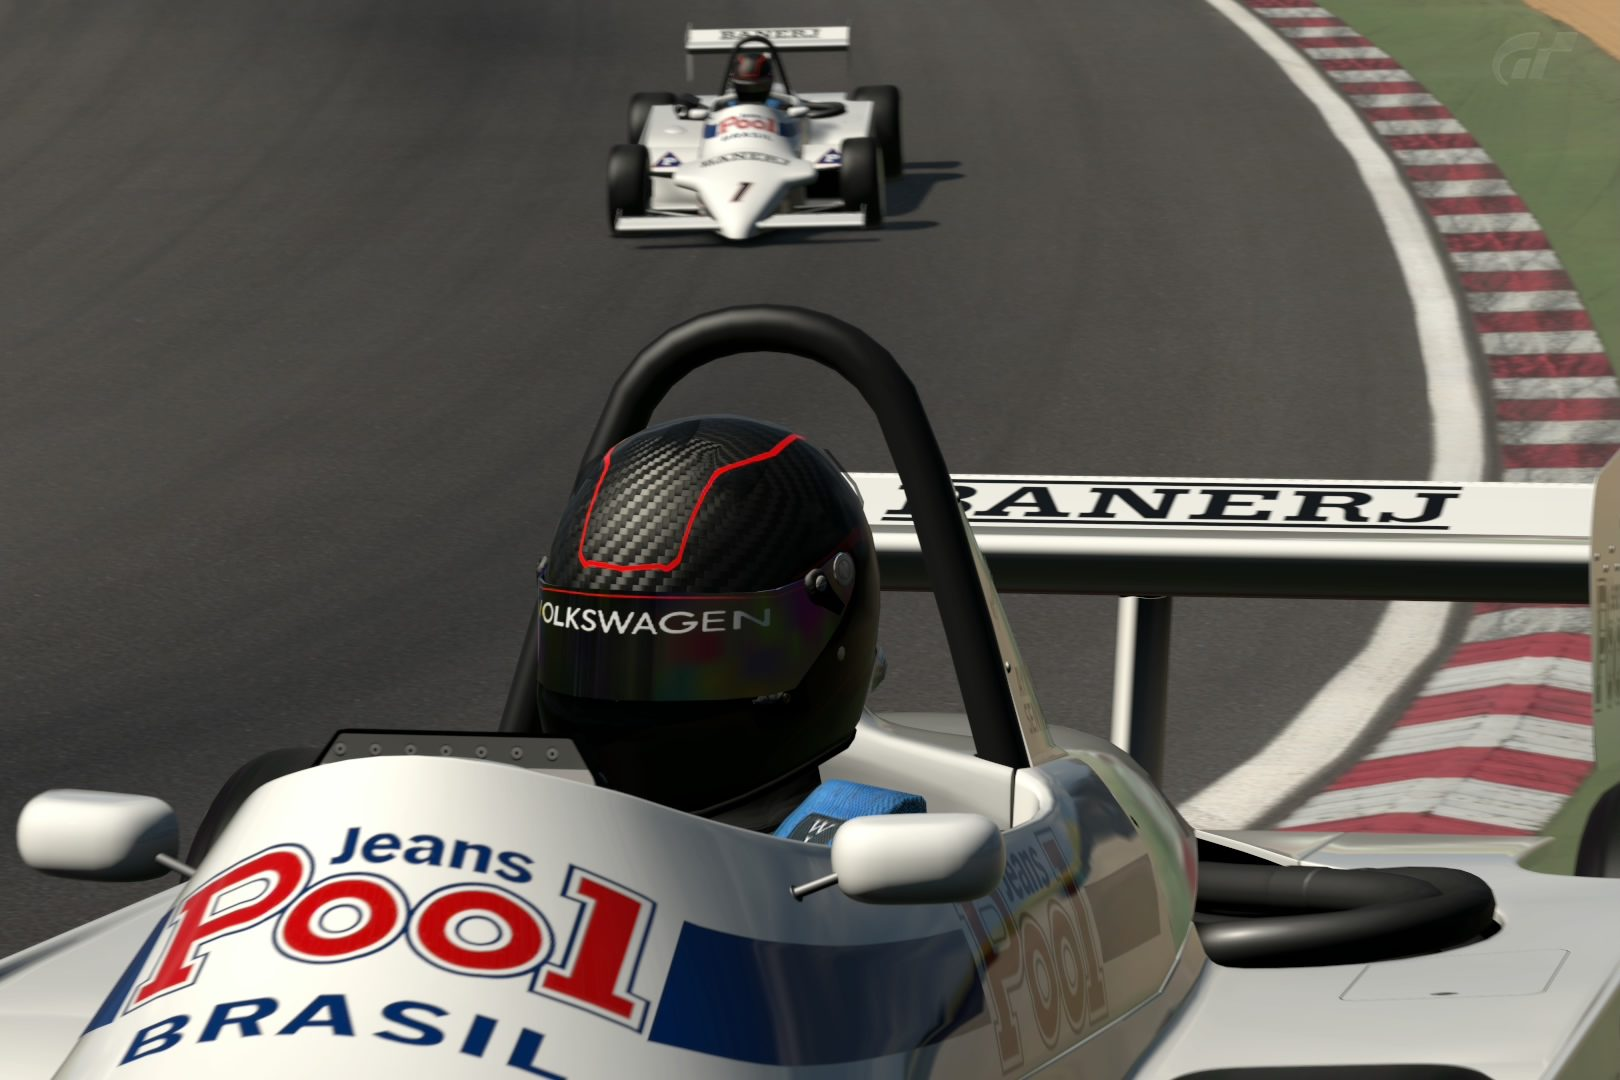 Brands Hatch Grand Prix Circuit '80s_18.jpg